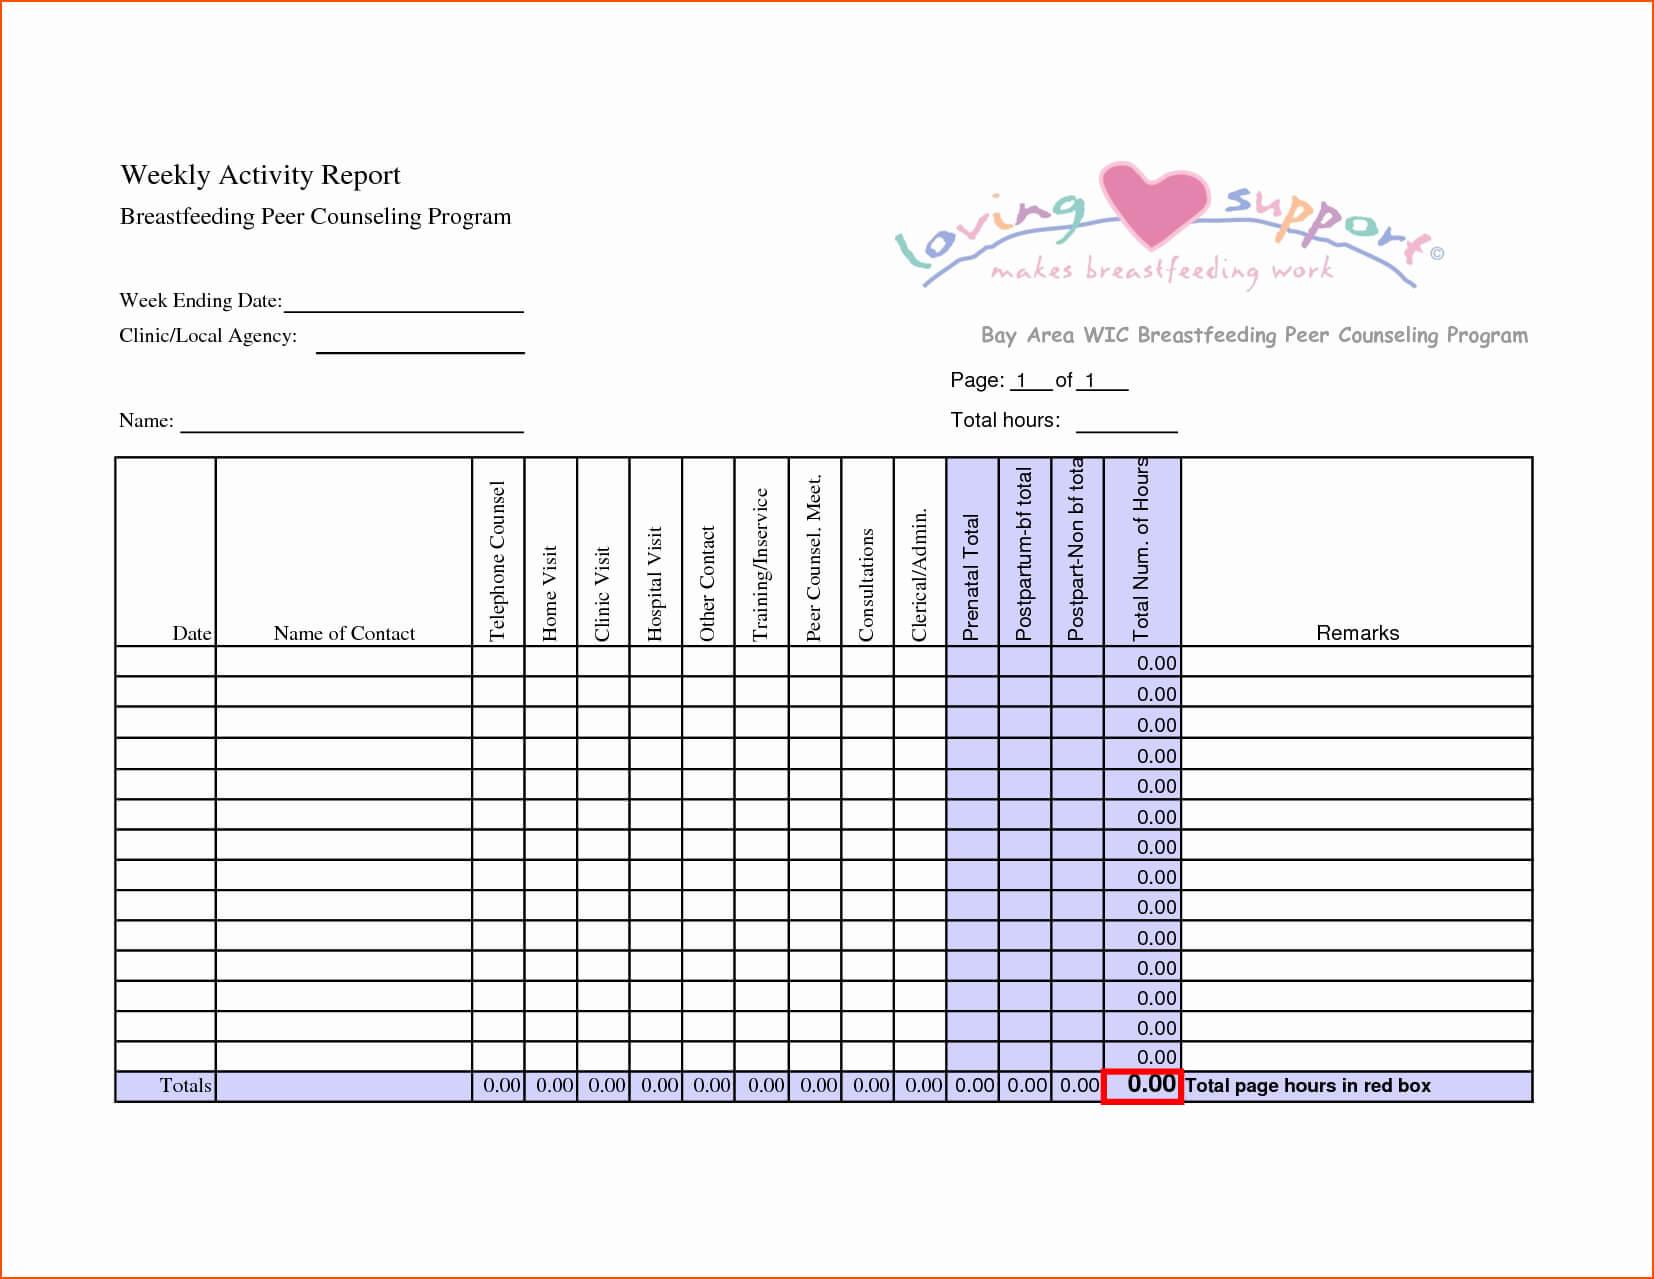 015 Weekly Activities Report Template Ideas Sales Activity With Regard To Sales Activity Report Template Excel